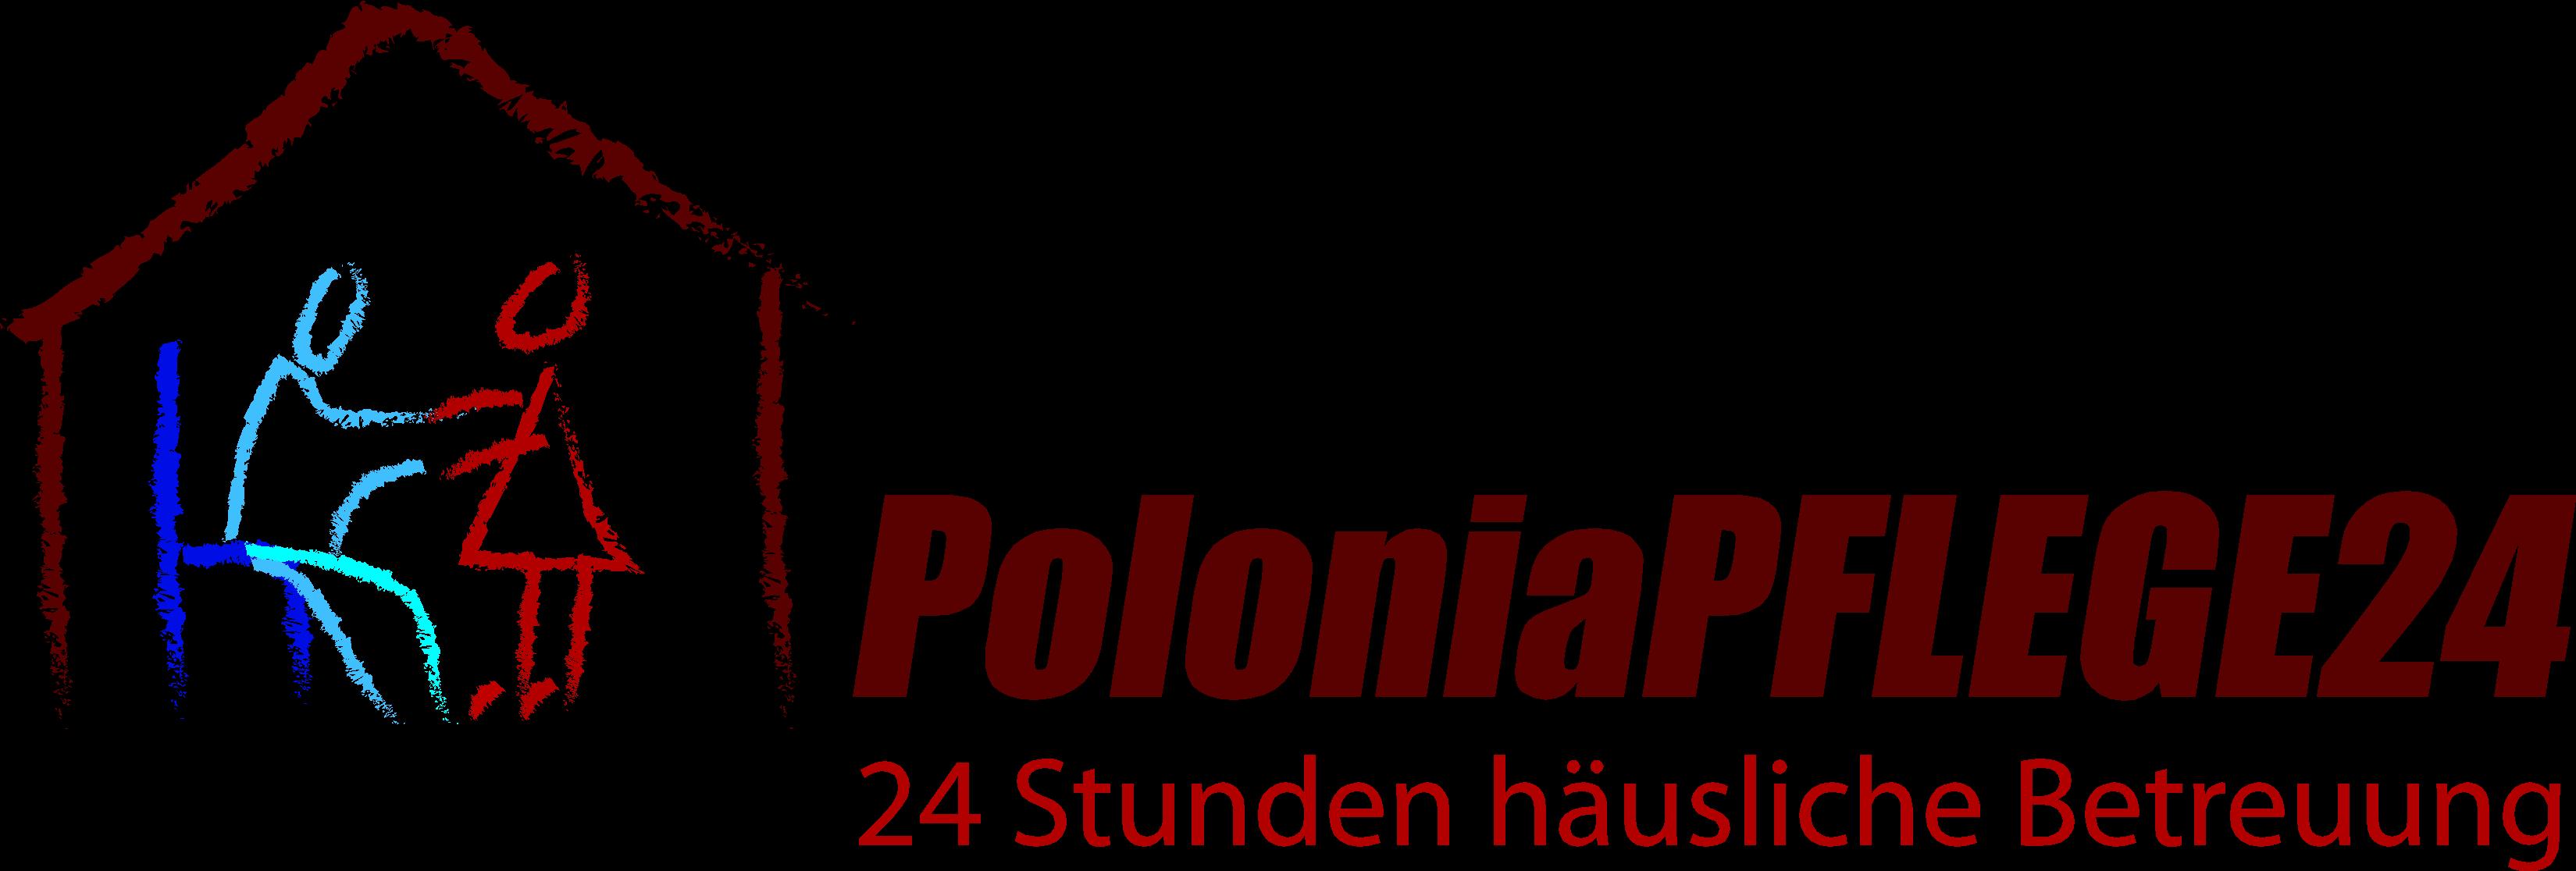 Logo Poloniapflege24